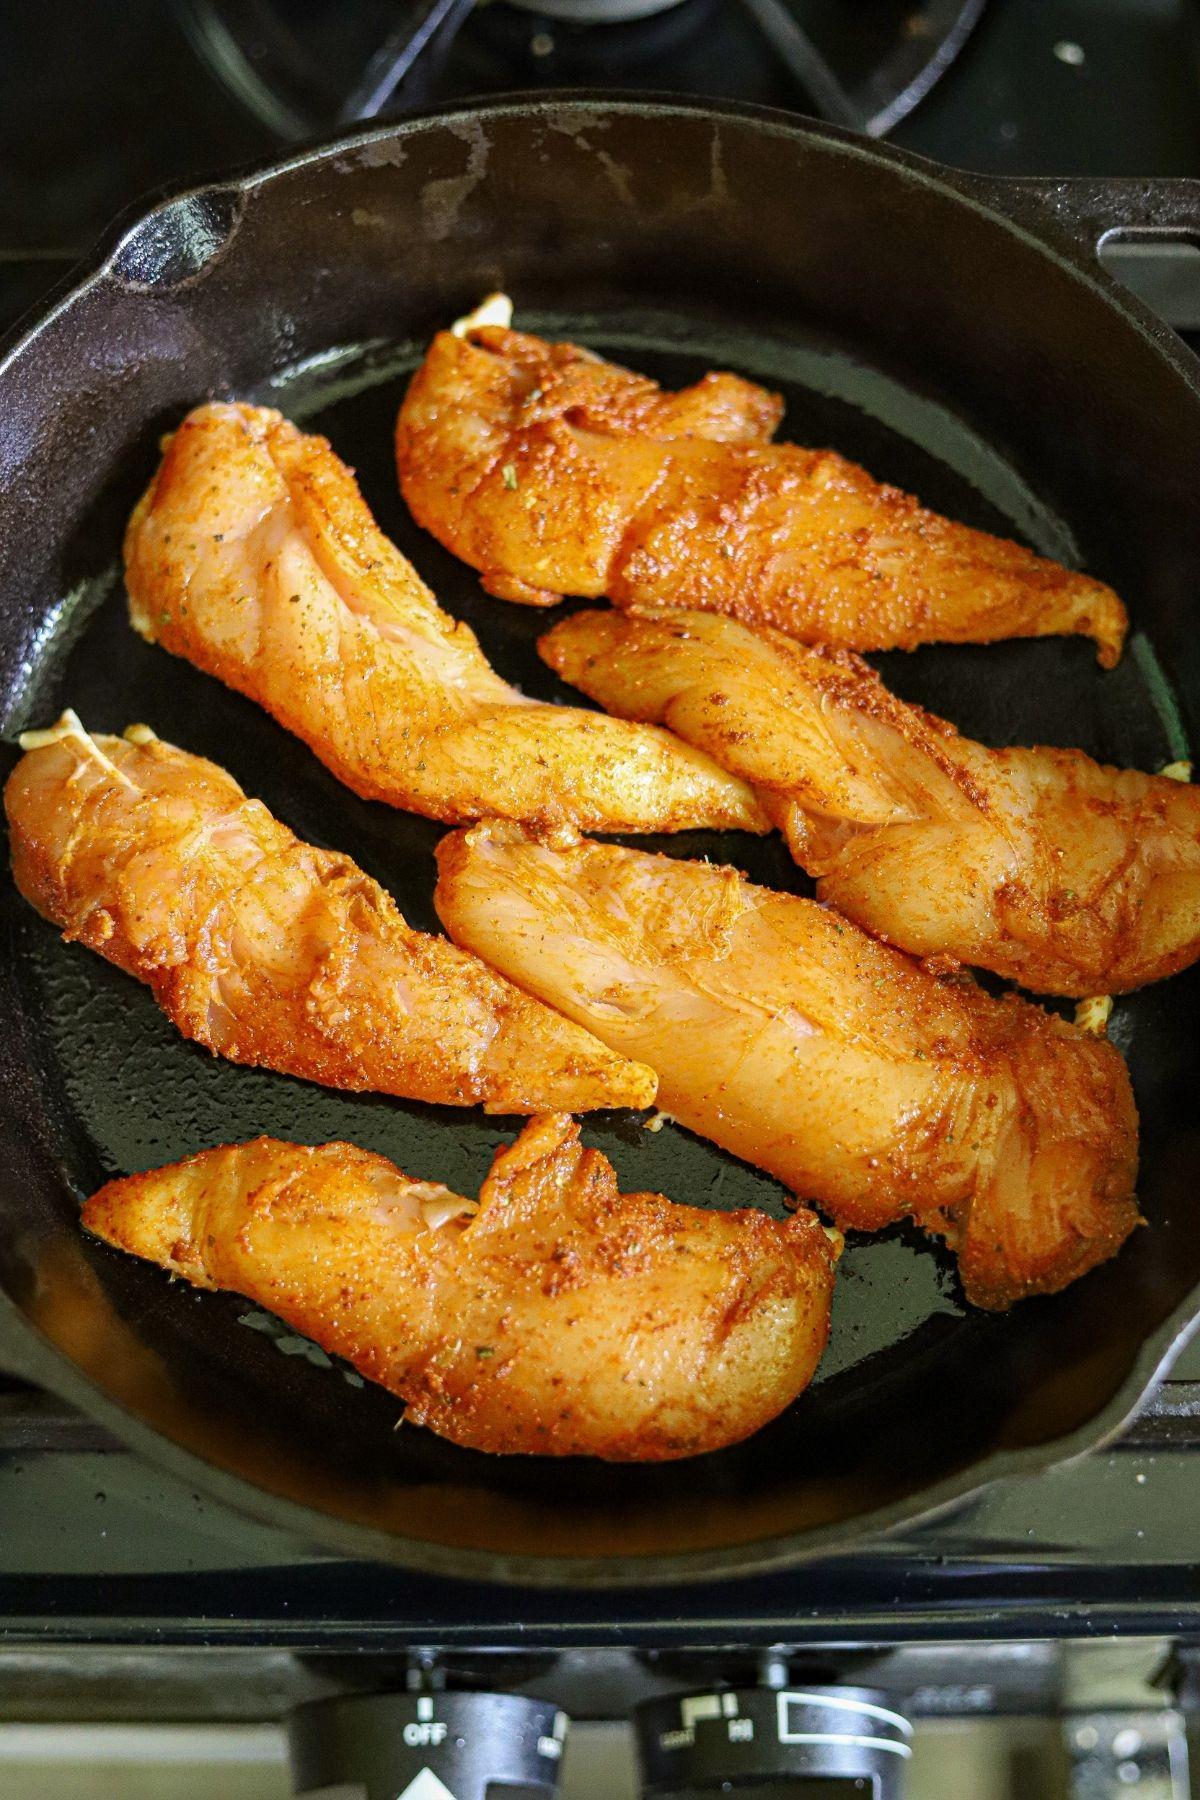 Chicken tenders coated in blackening seasoning, cooking in a cast iron skillet.